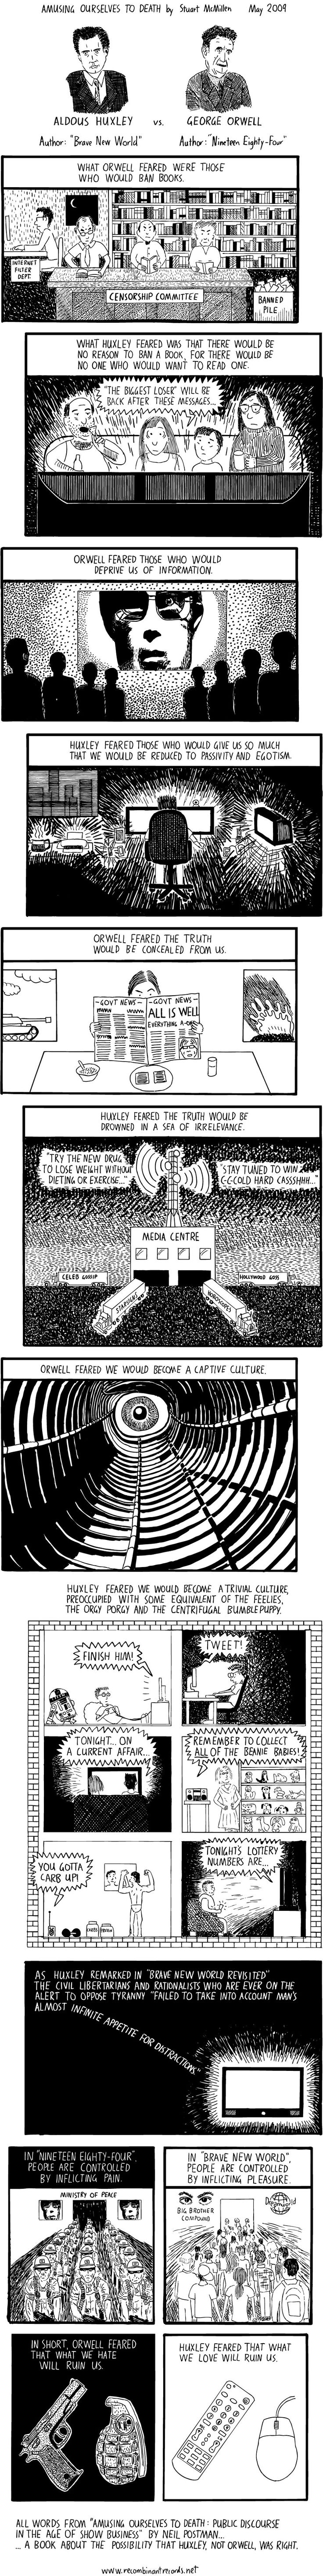 huxley vs orwell essay